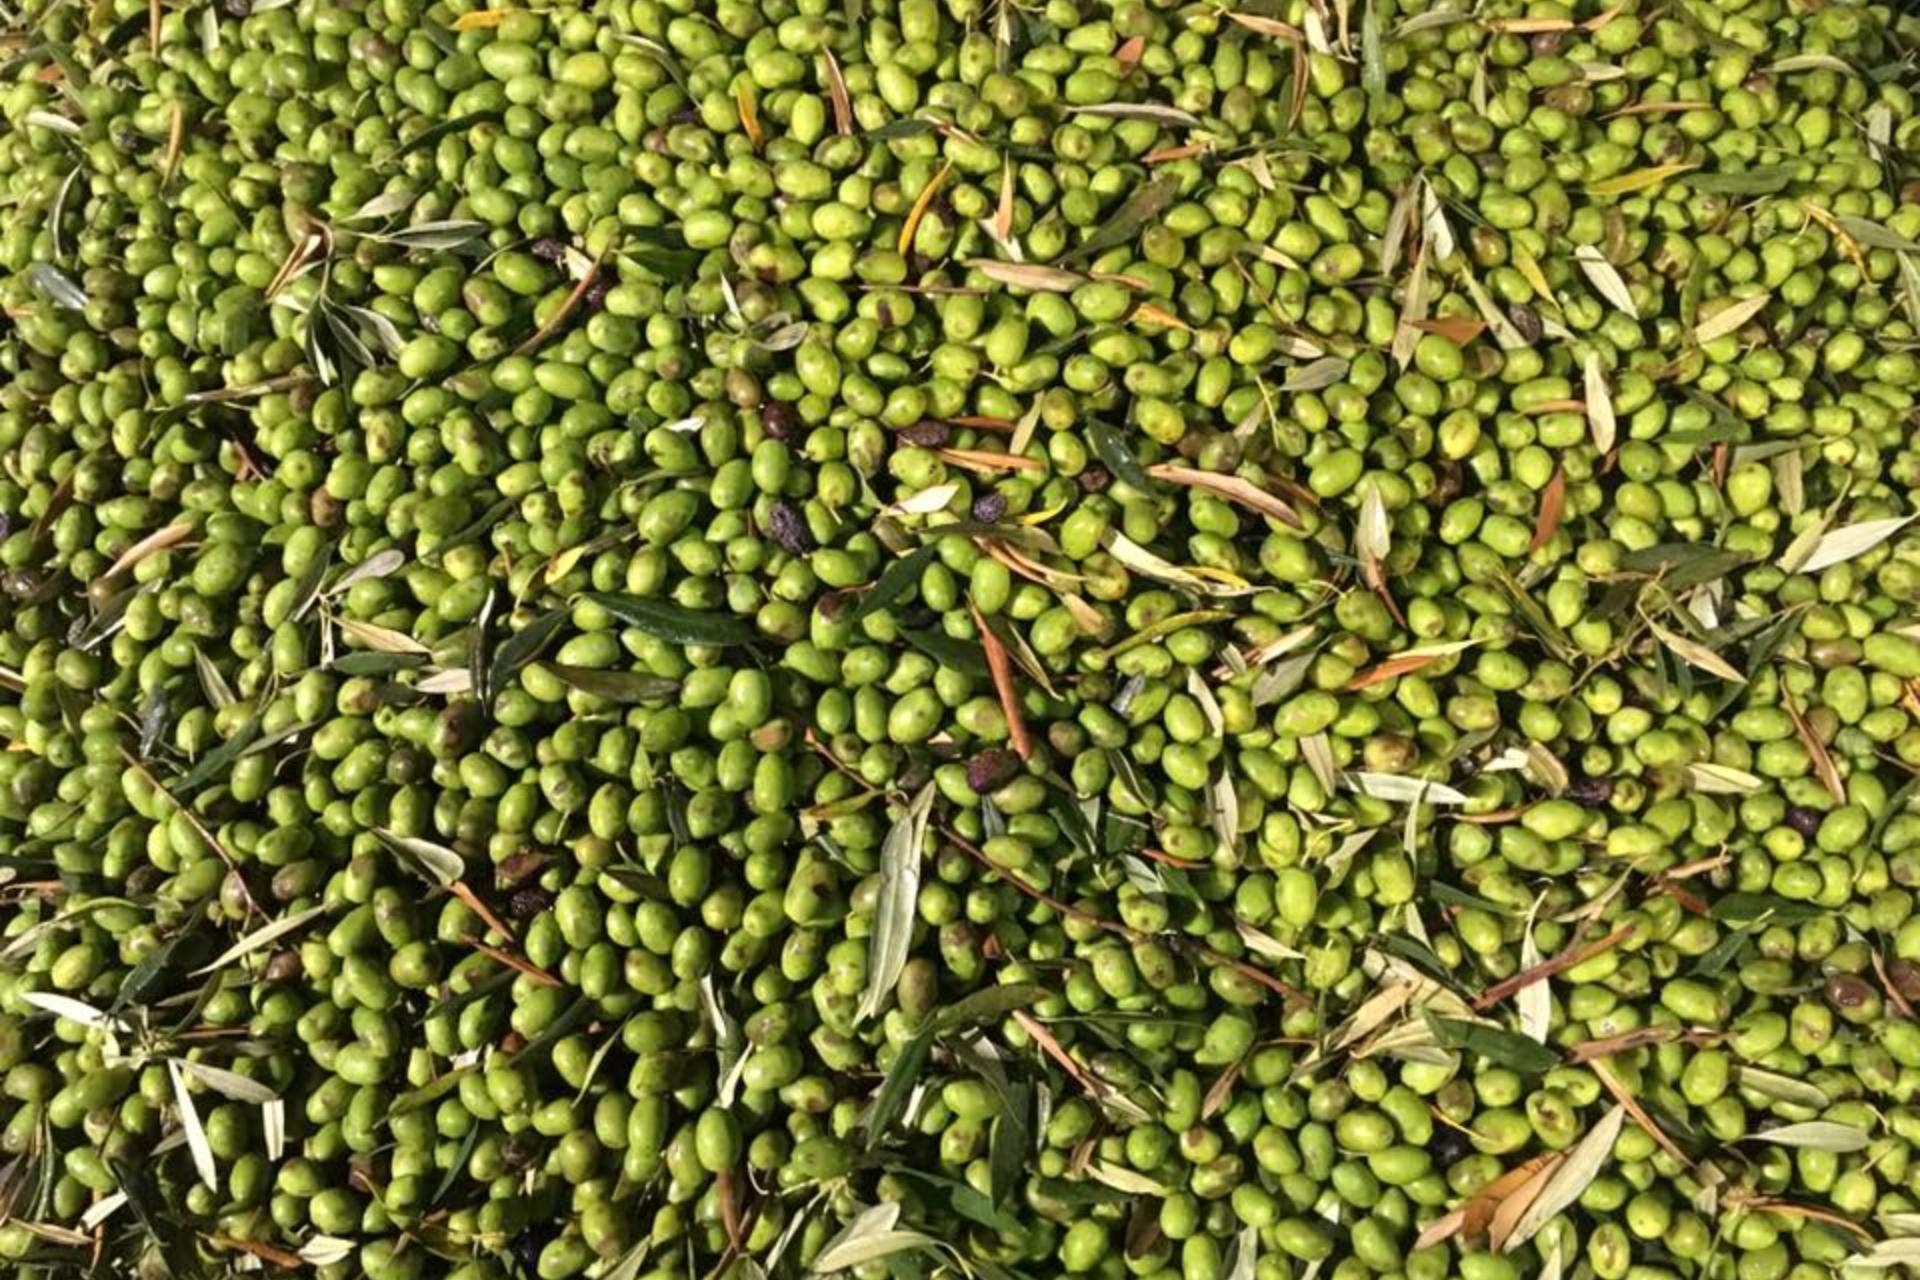 Olive, Toscana - Podere Fornelli, olio extravergine di oliva toscano